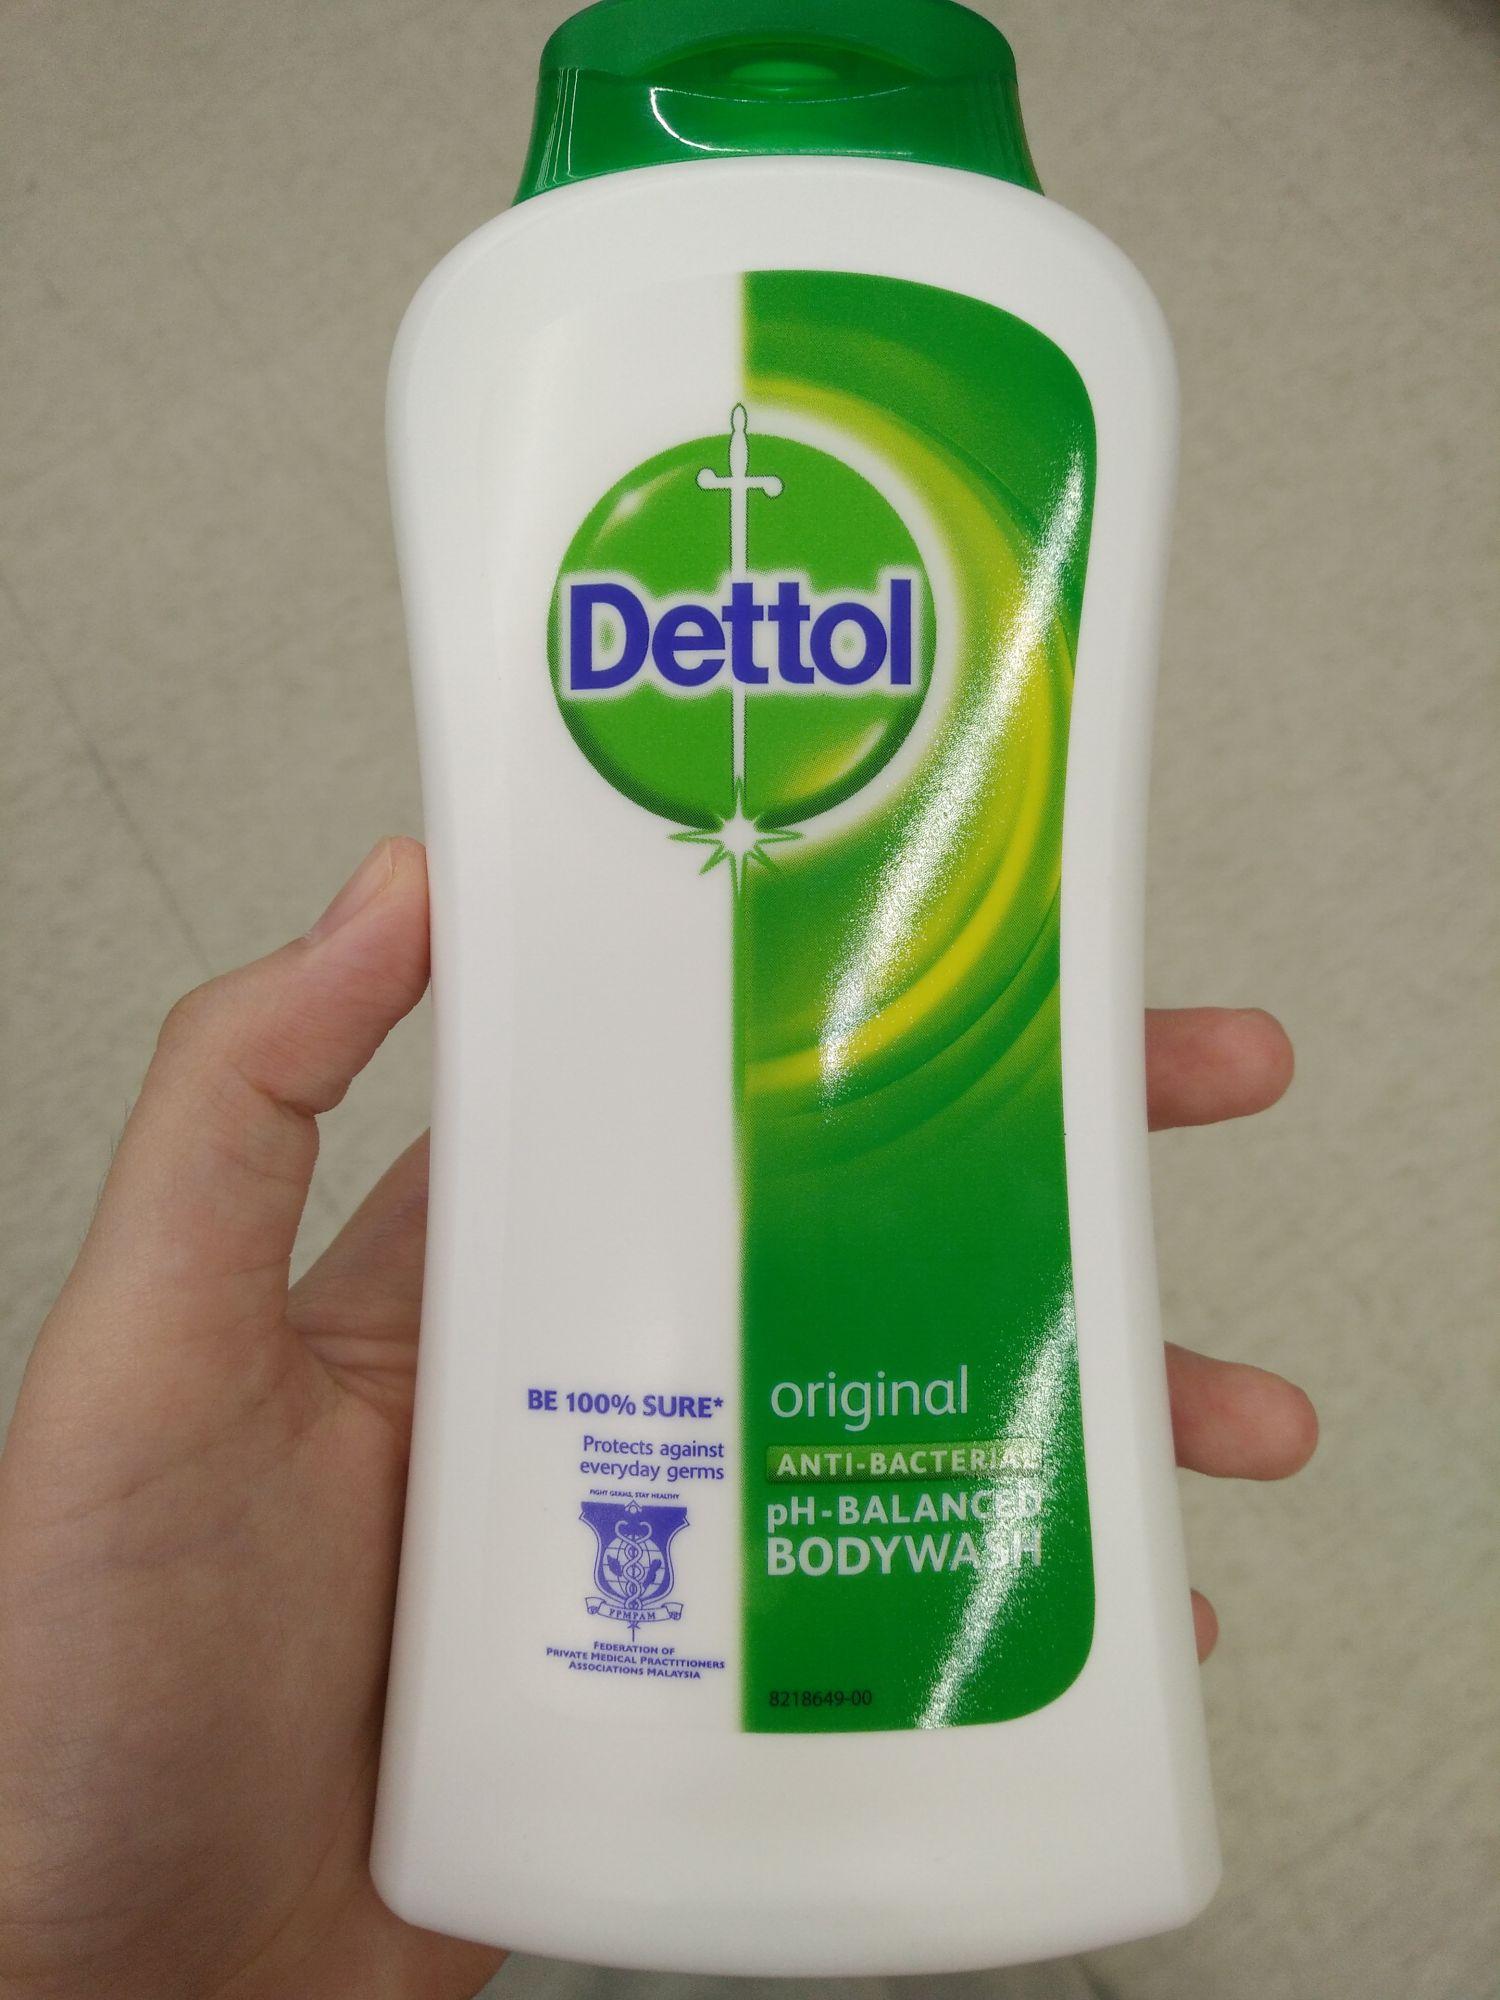 Dettol Original Shower Foam Reviews